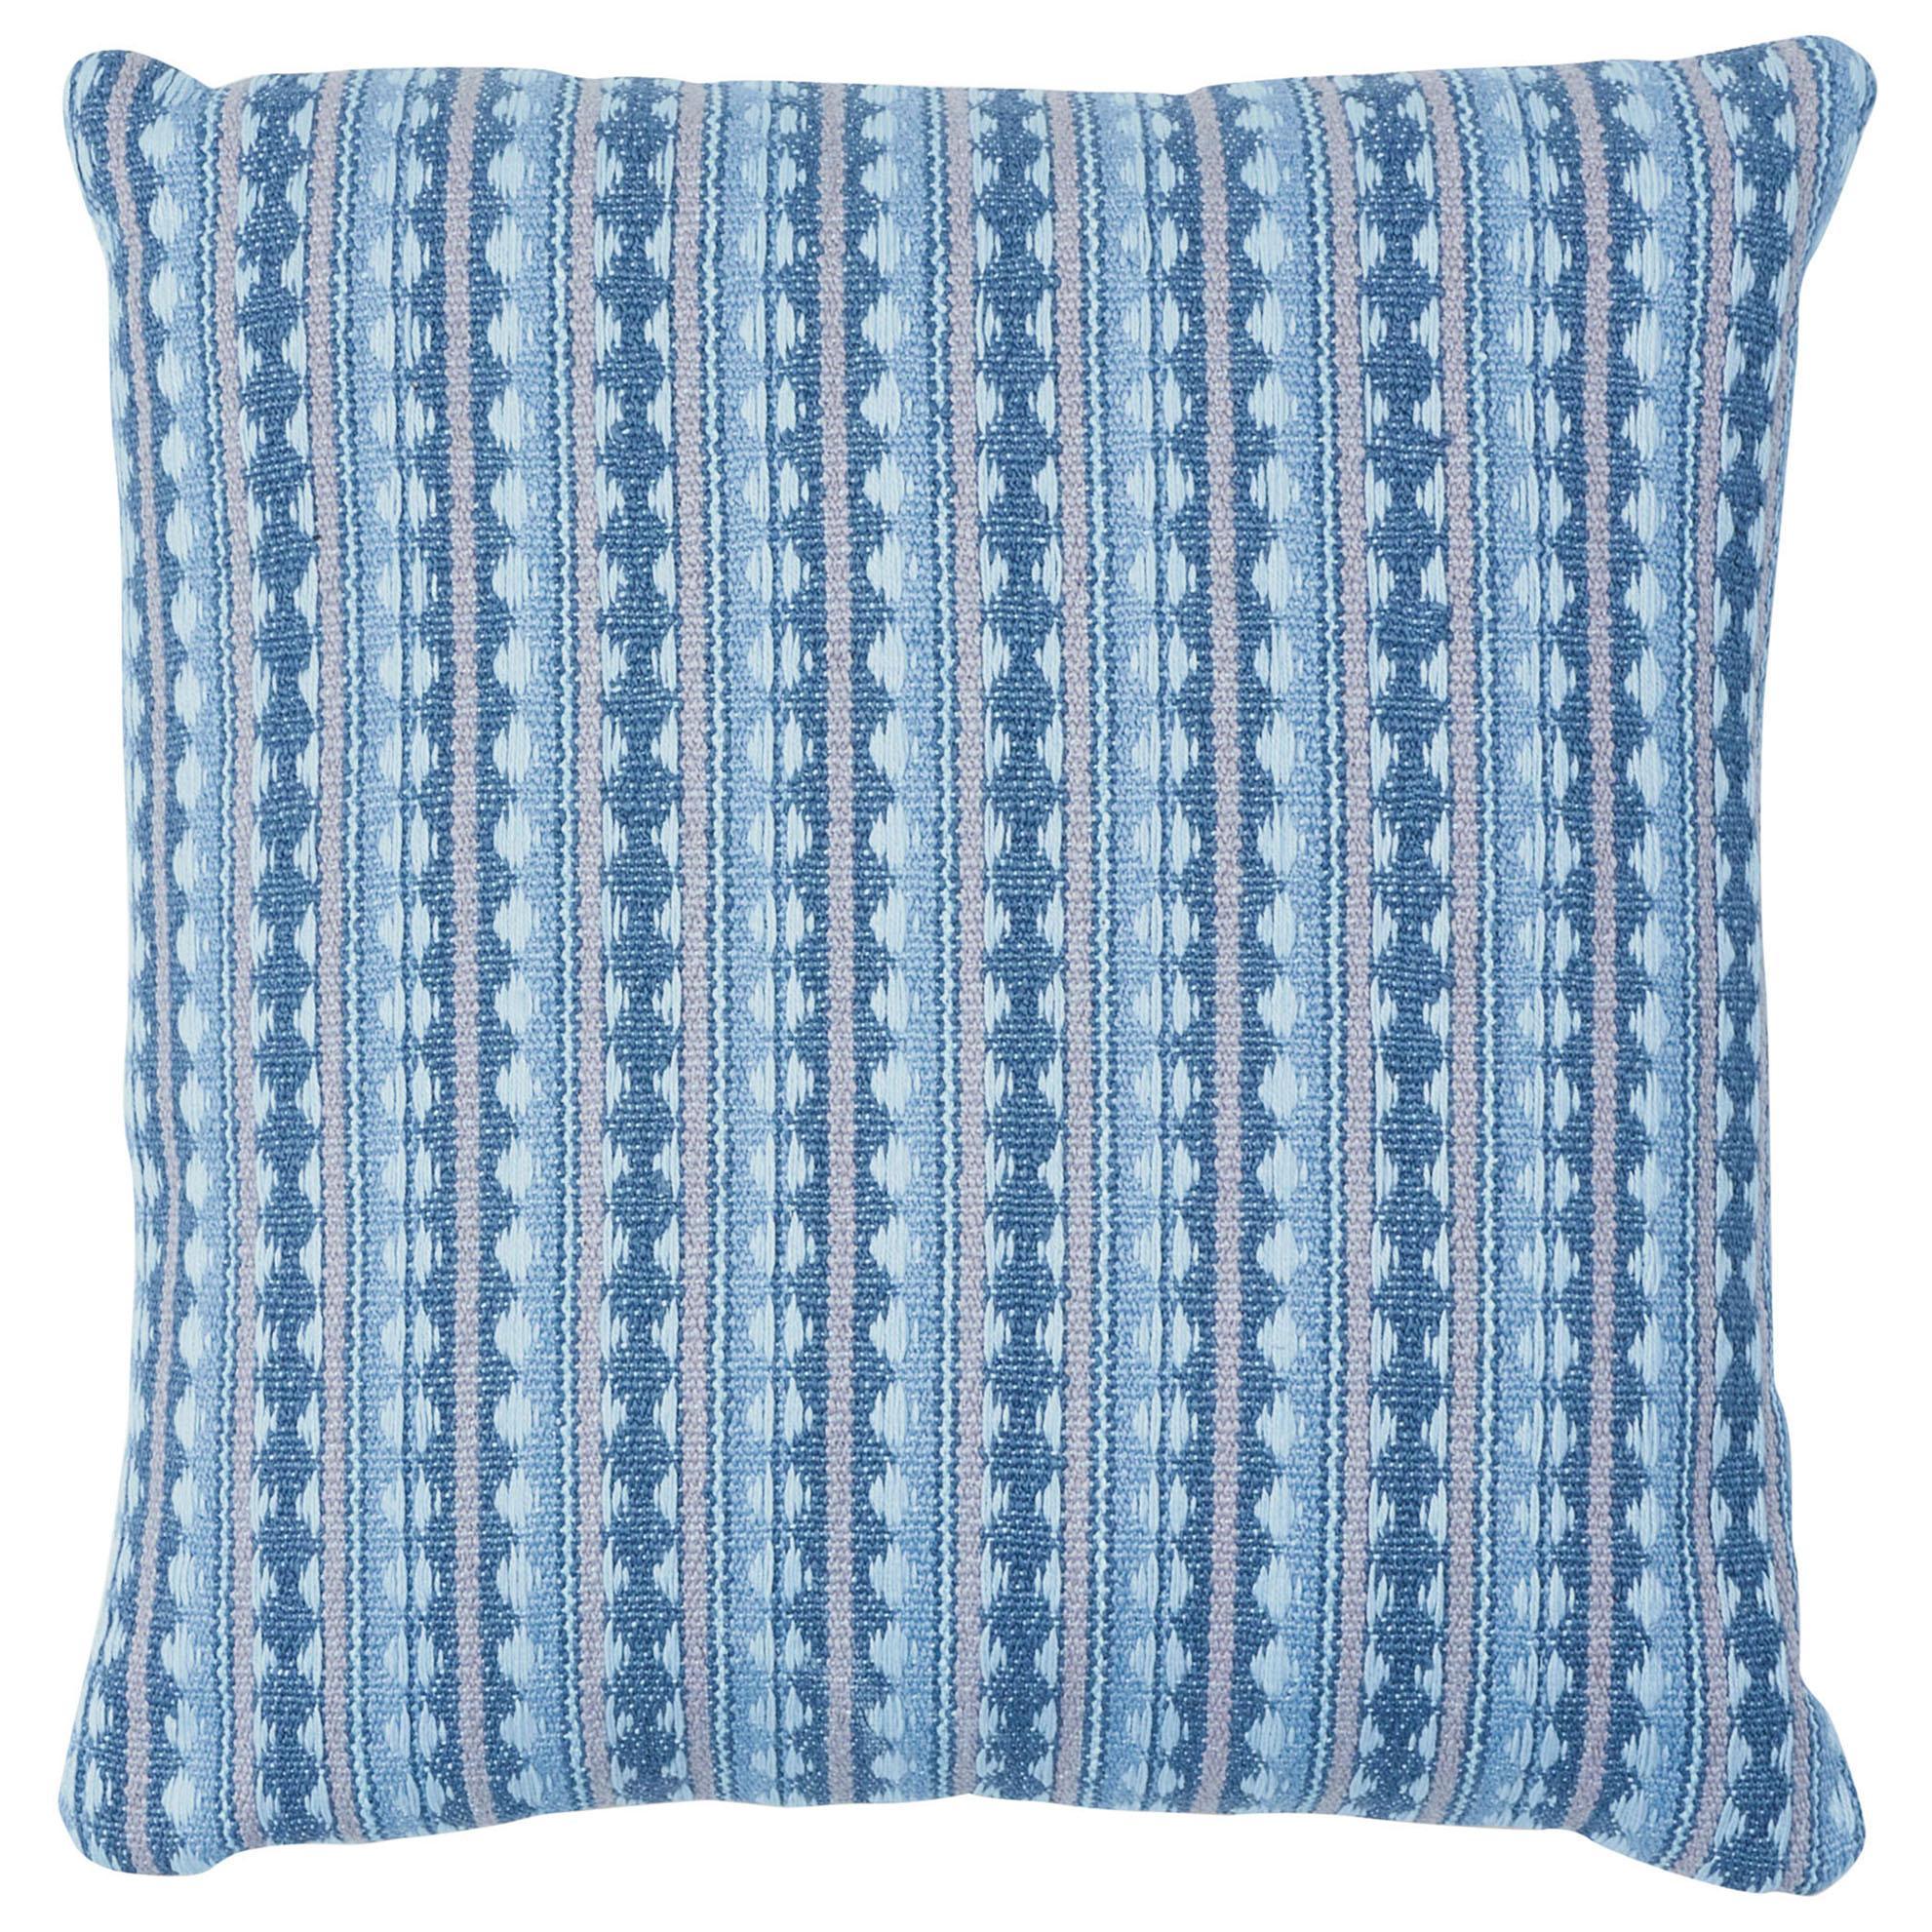 Schumacher Tarnby Stripe Pillow in Sky